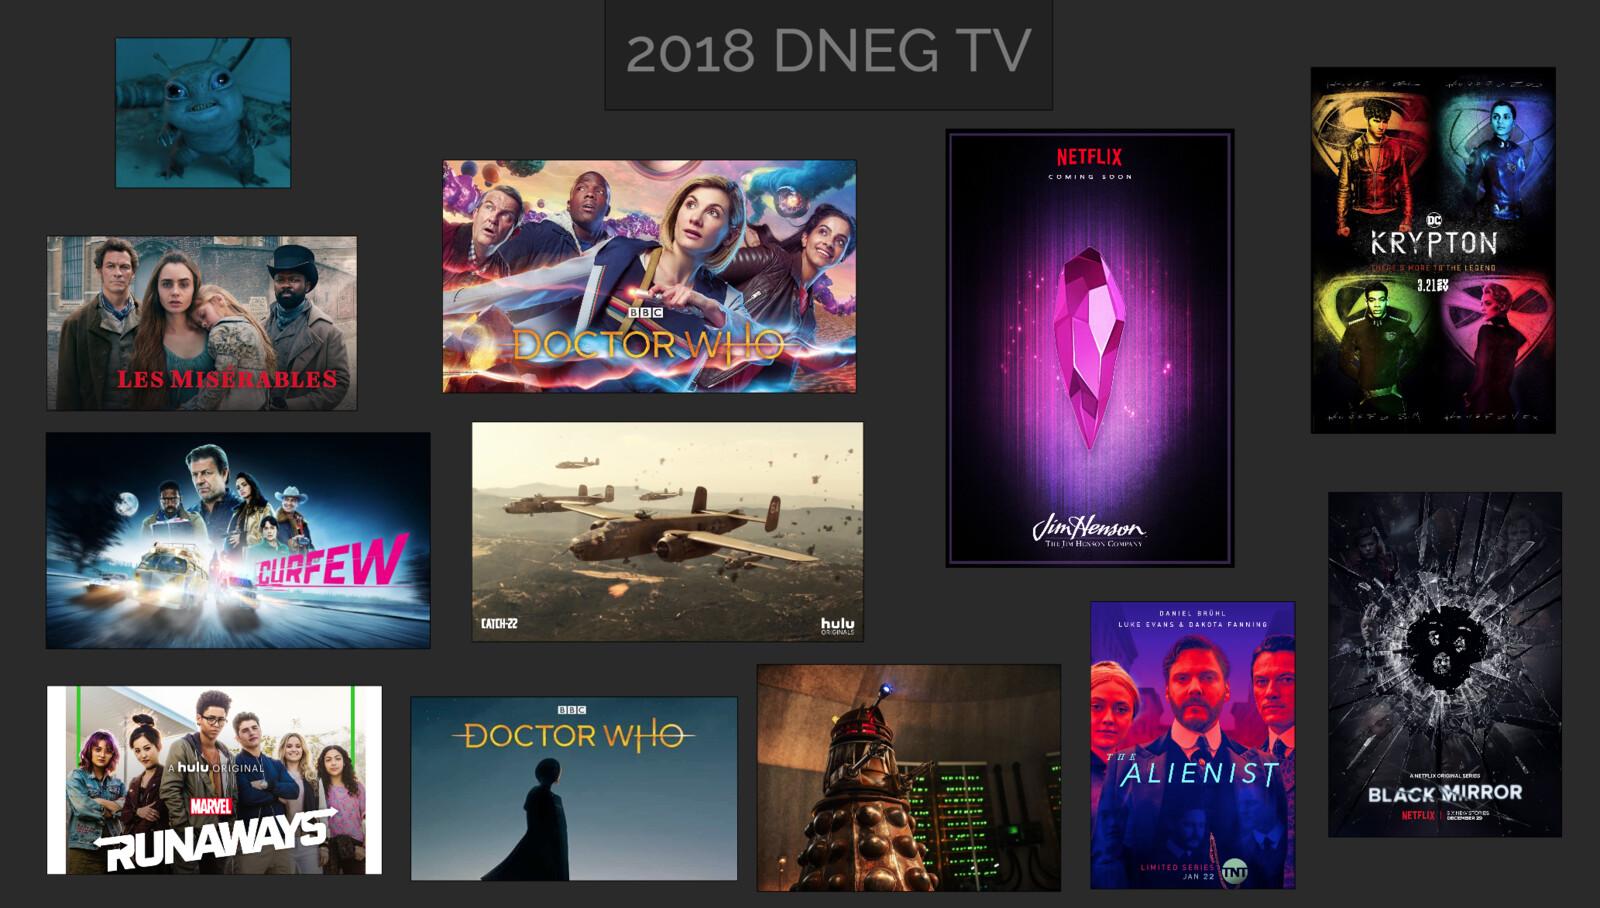 2018 At DNEG TV